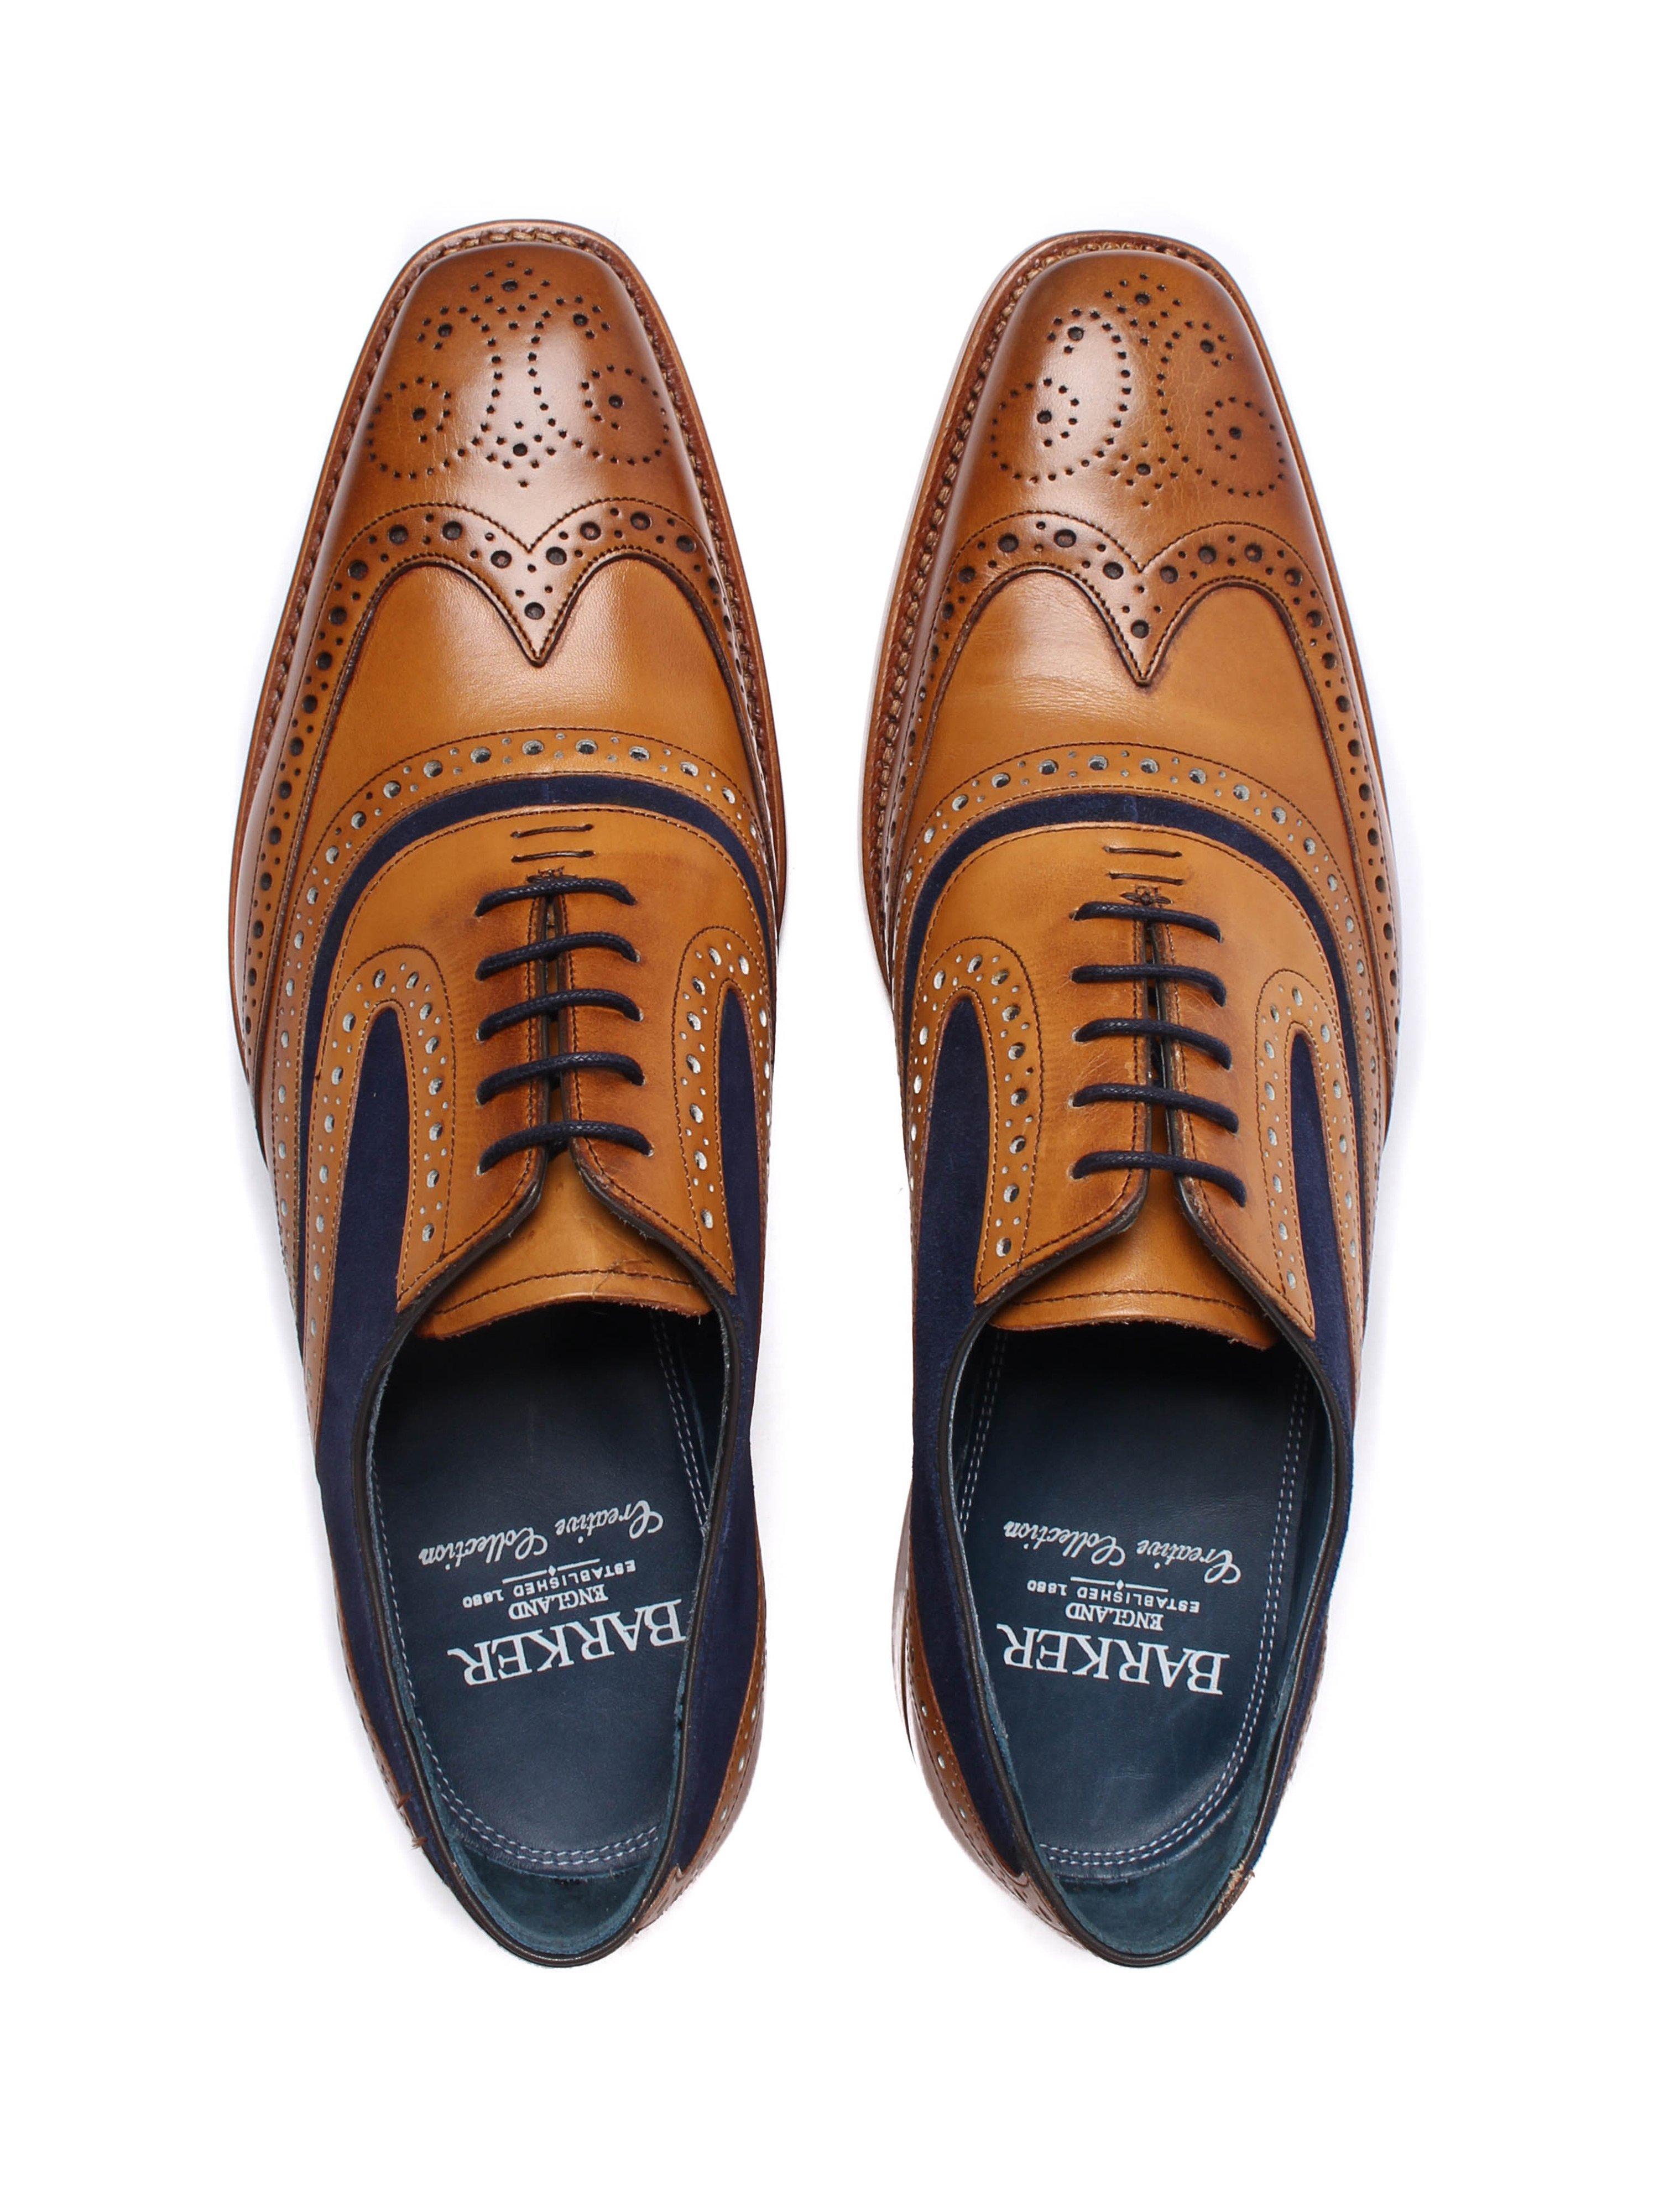 Barker Men's McClean Leather Oxford Brogues - Cedar & Navy